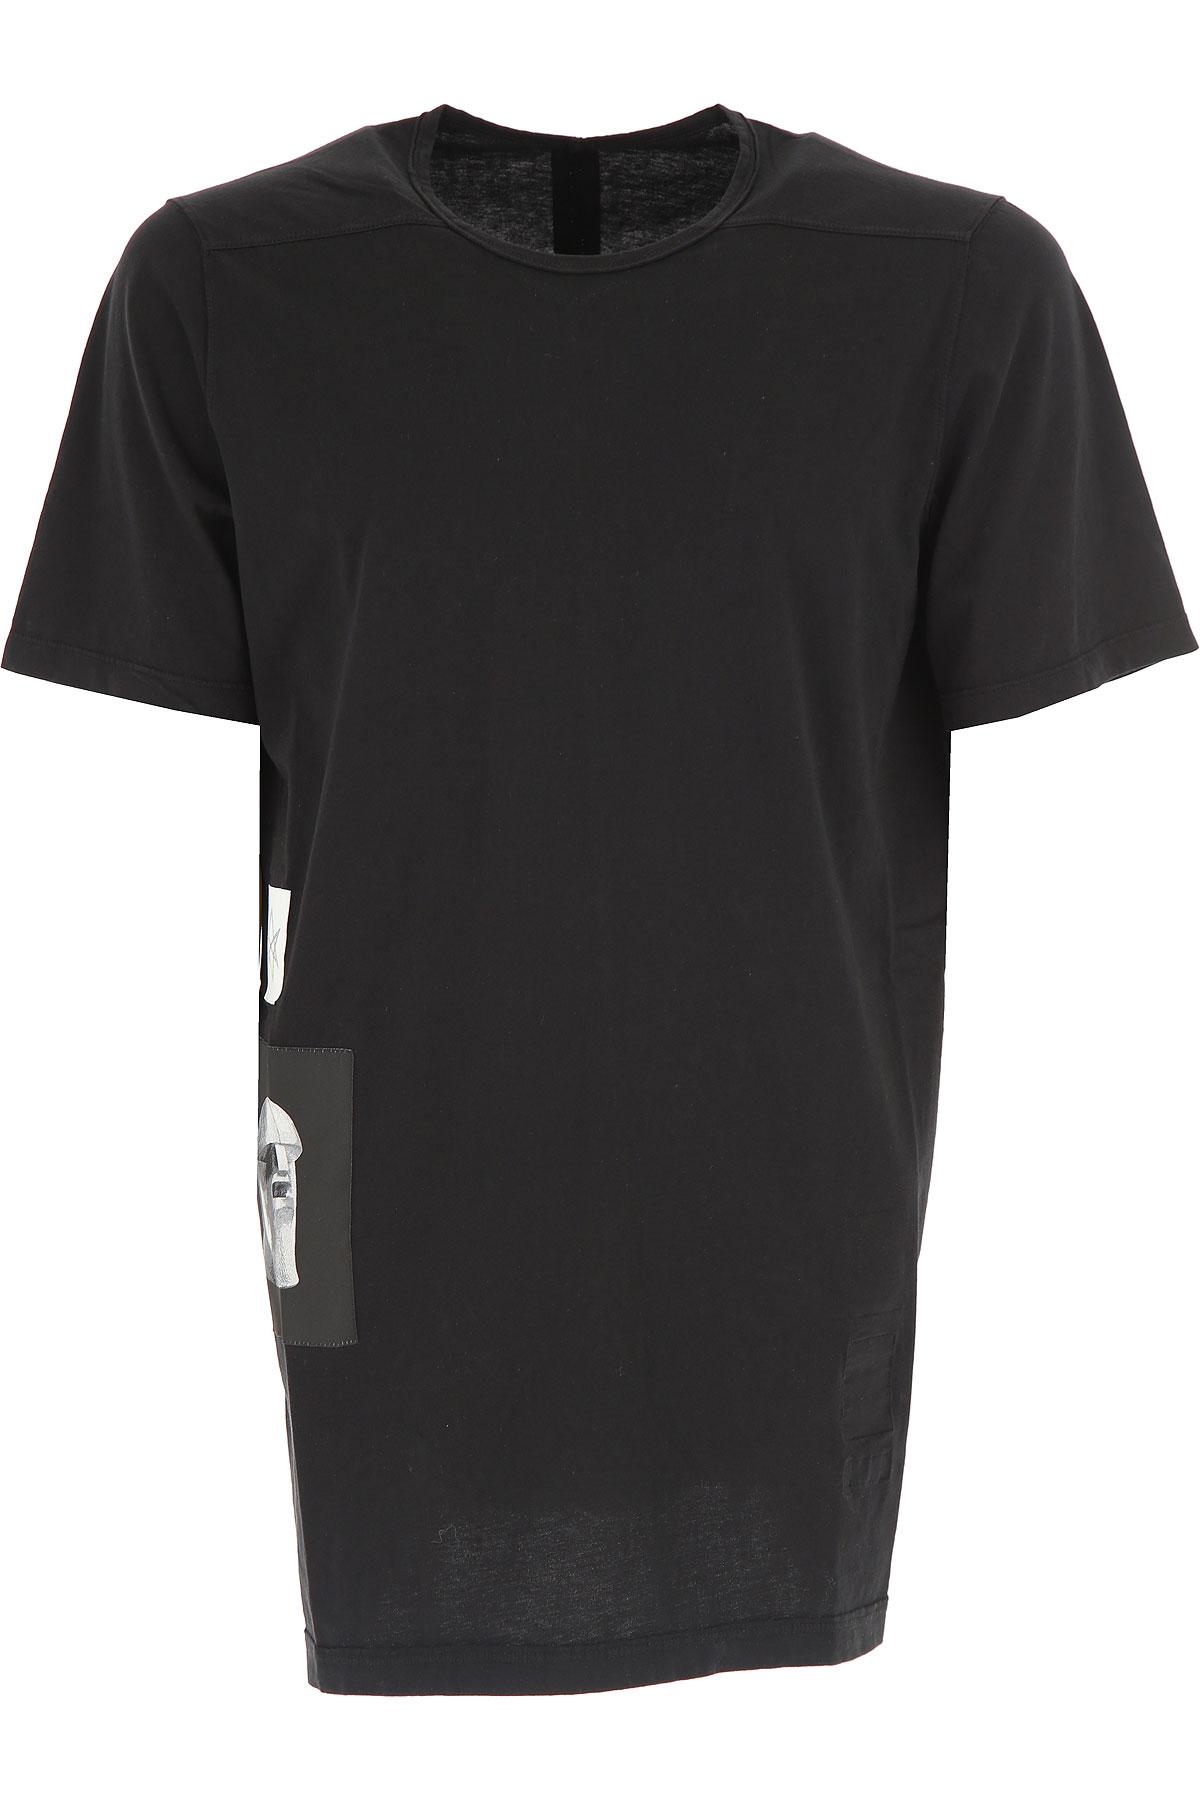 Rick Owens DRKSHDW T-Shirt for Men On Sale in Outlet, Black, Cotton, 2019, L M